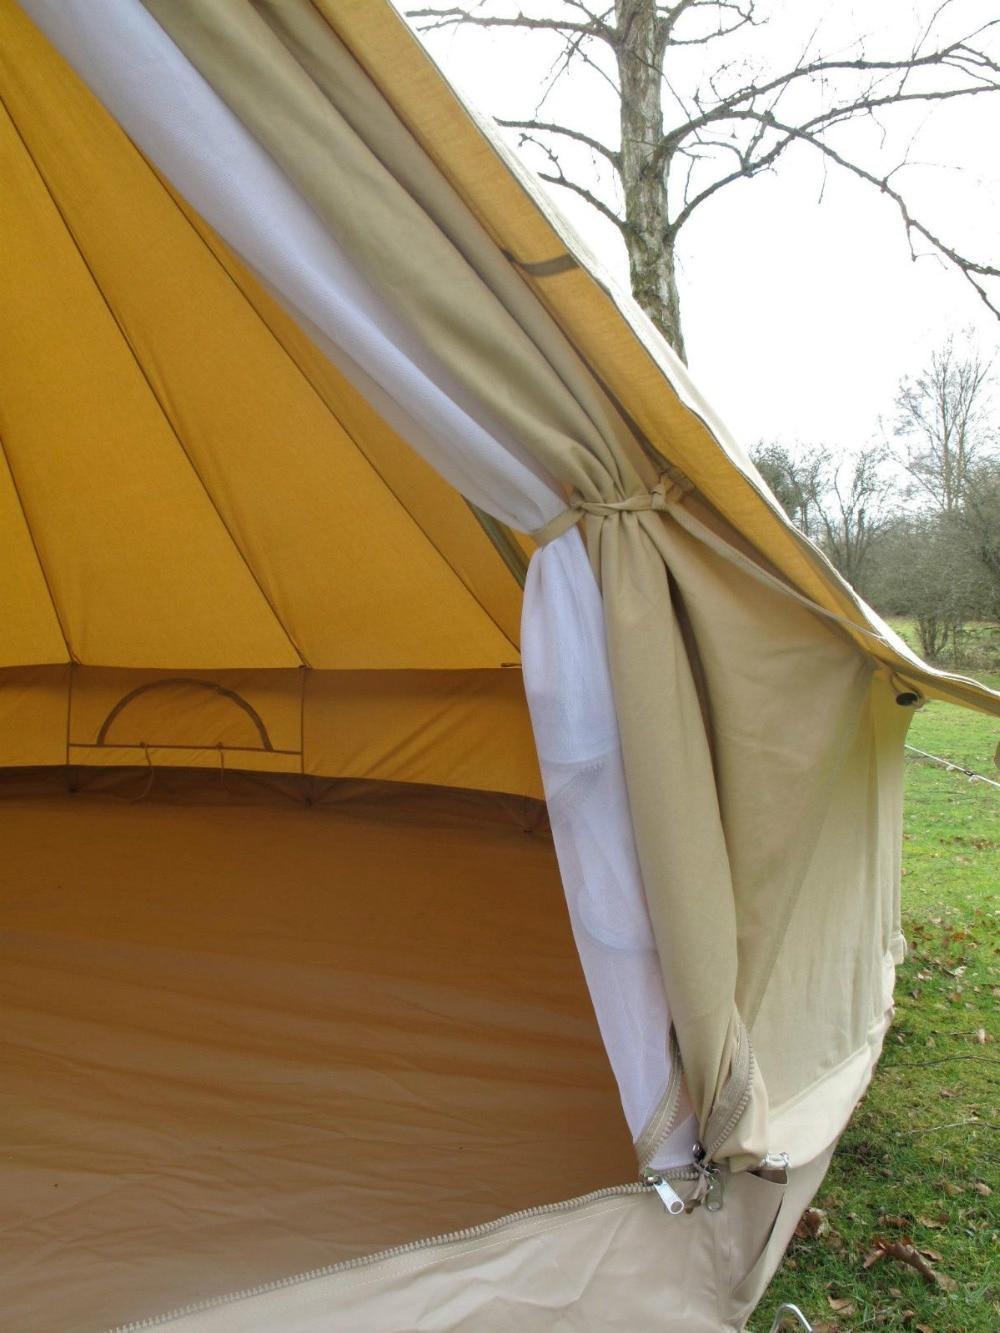 DANCHEL 4M Meter 13 Feet Diameter Canvas Bell Tent Outdoor All Season Sun Shade Travel Waterproof 400 Ultimate Tent-in Tents from Sports u0026 Entertainment on ... & DANCHEL 4M Meter 13 Feet Diameter Canvas Bell Tent Outdoor All ...